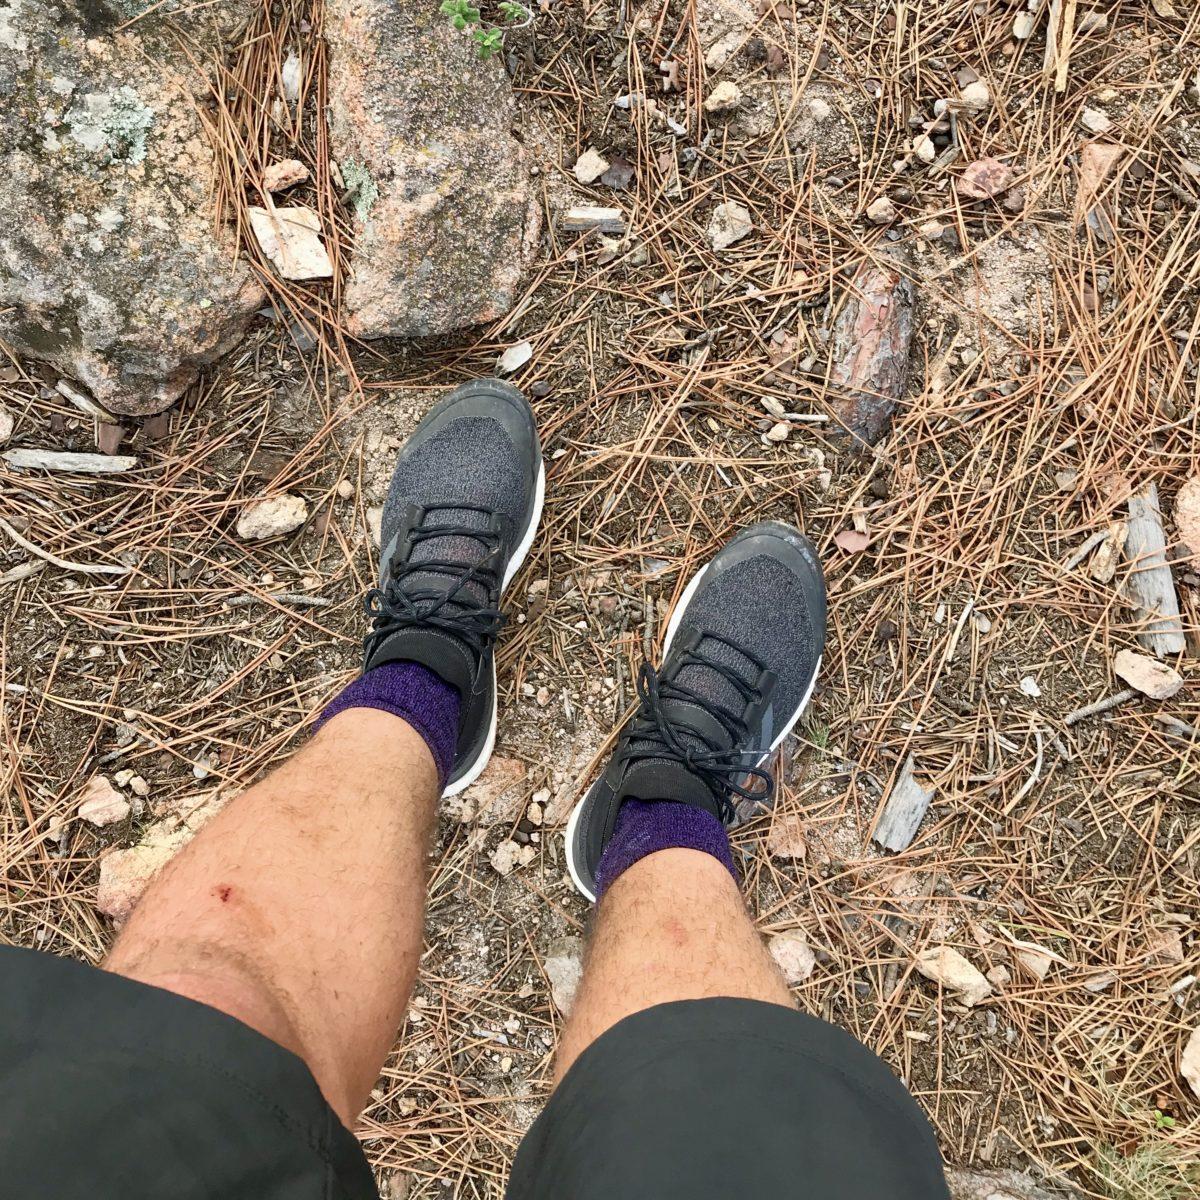 Nach dem Regen ist vor dem Trocknen: adidas terrex free hiker Wanderschuh